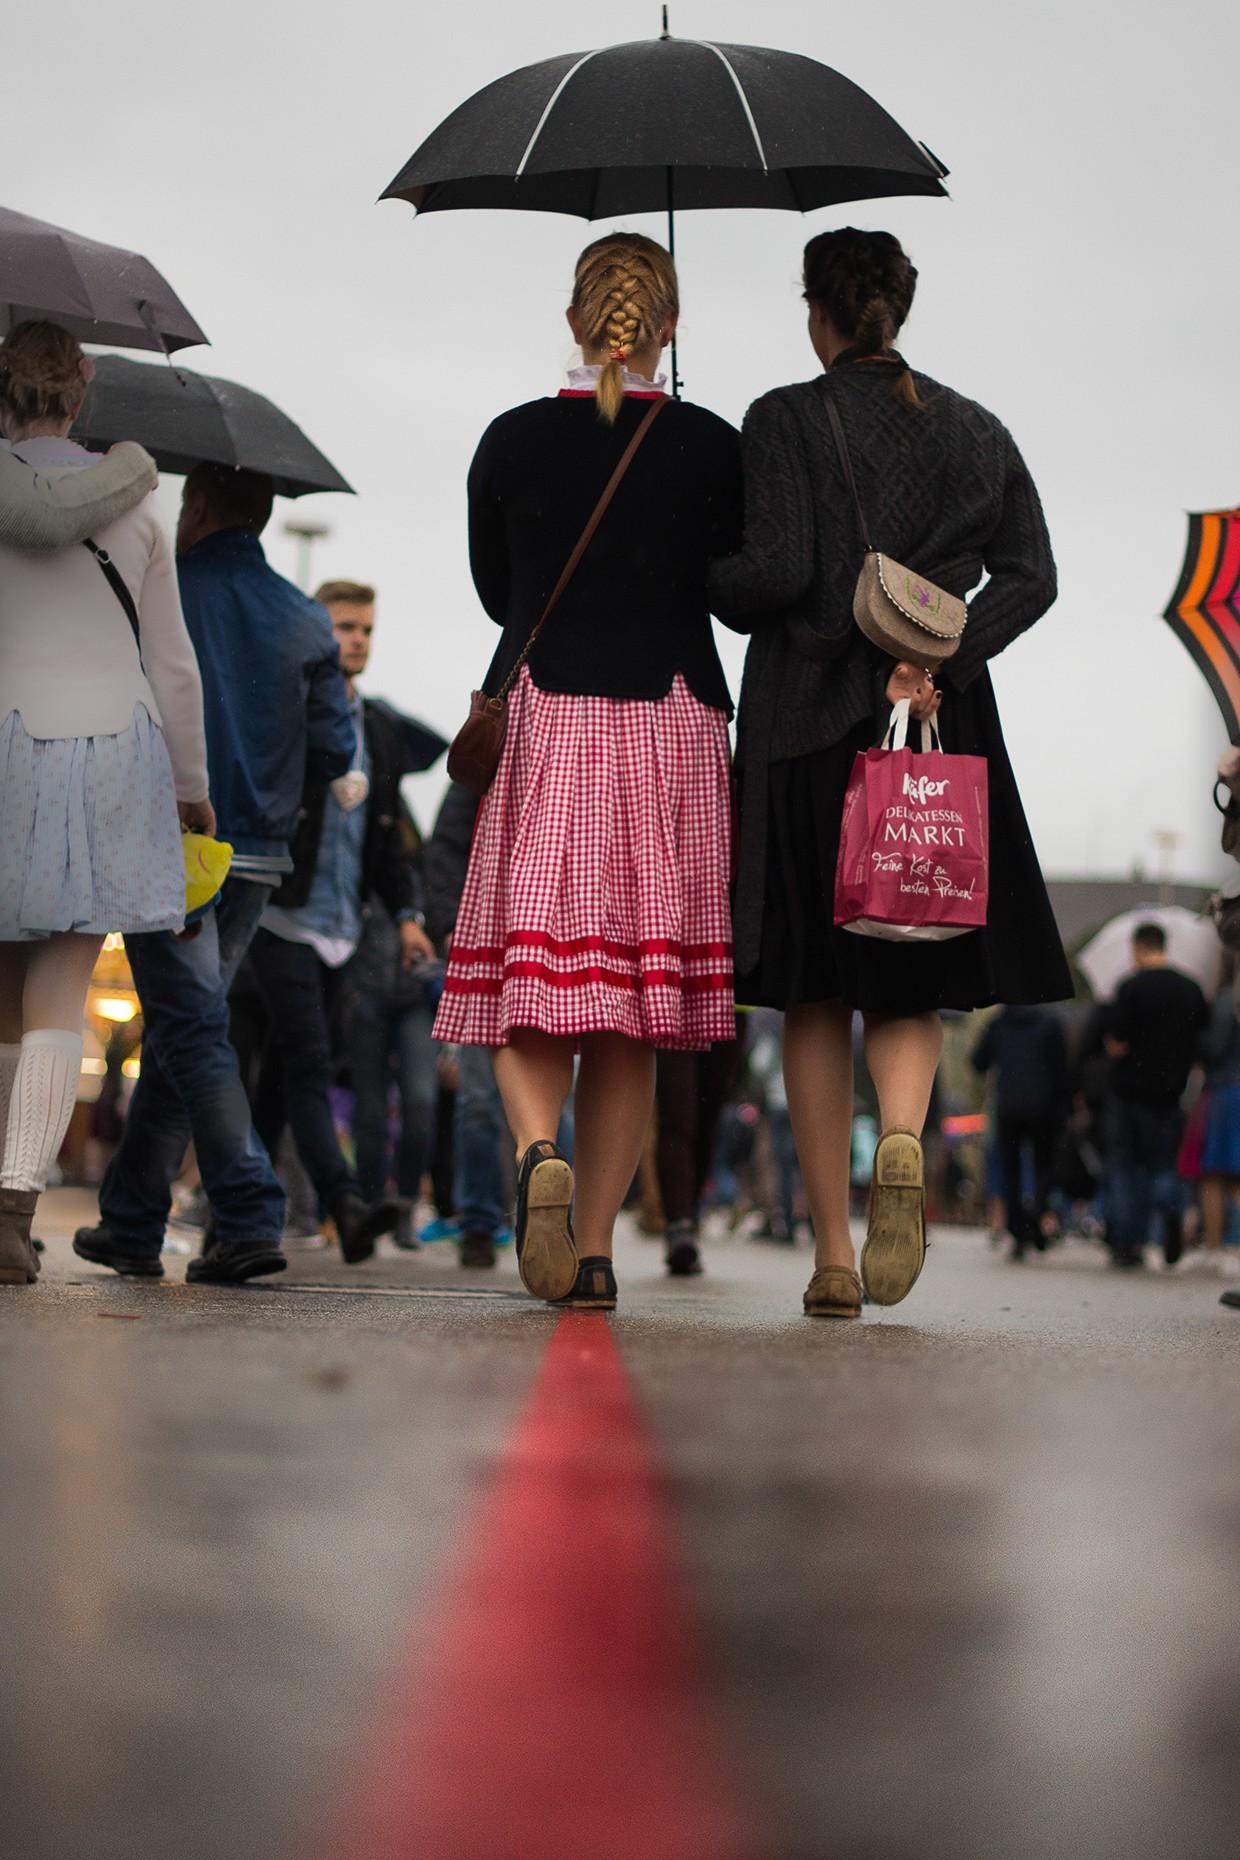 The Oktoberfest Spirit 2016